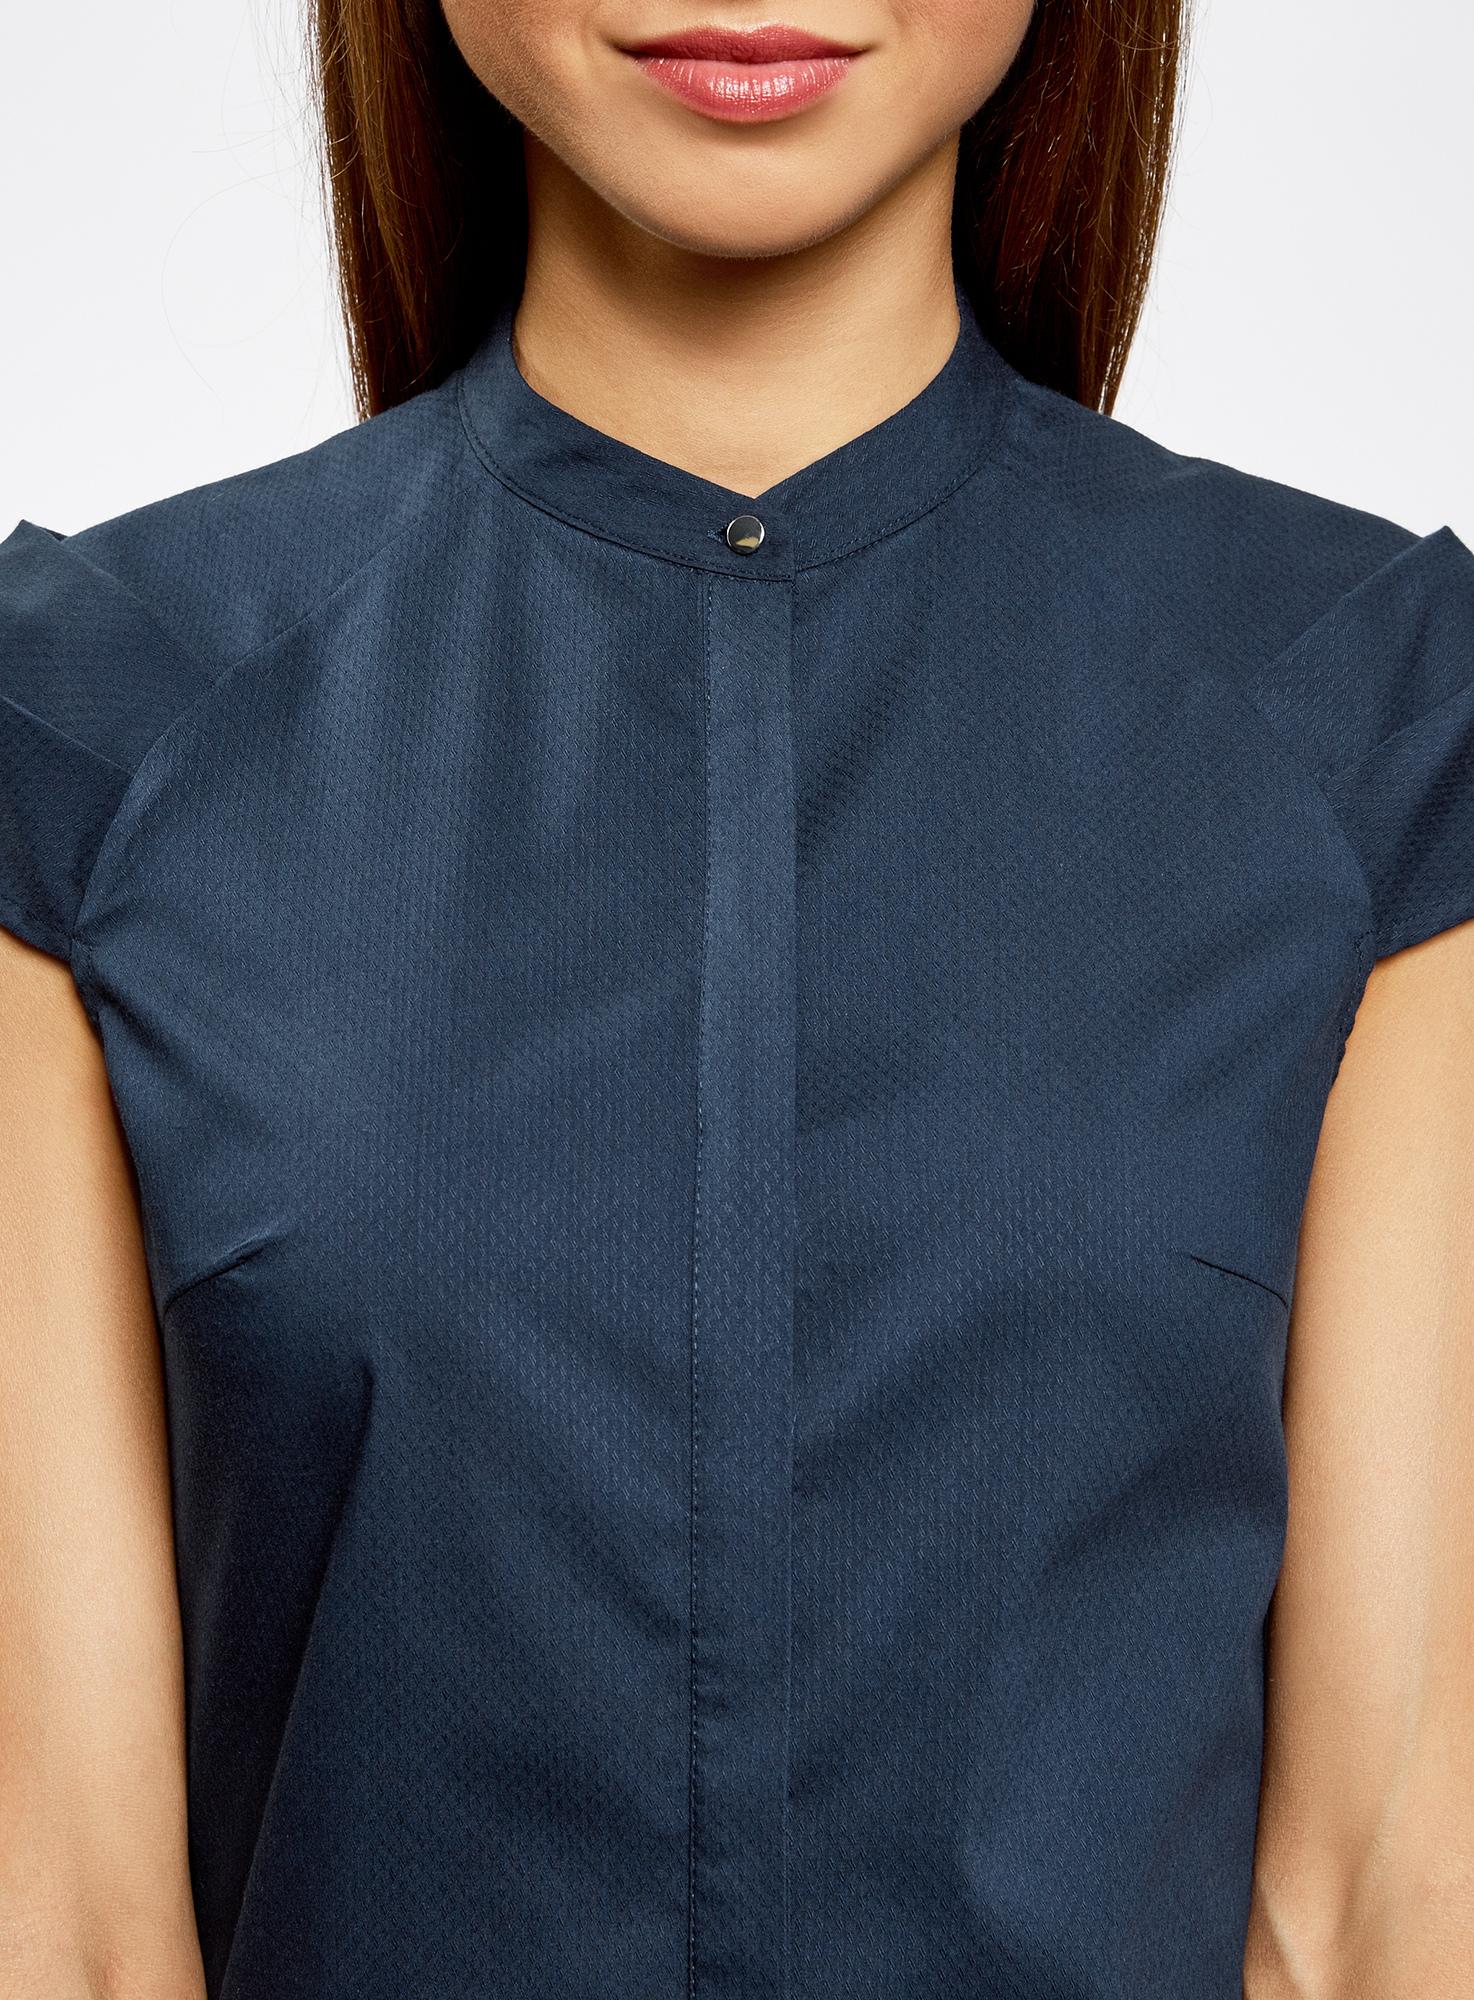 Рубашка с коротким рукавом из хлопка oodji для женщины (синий), 11403196-1/18193/7900N